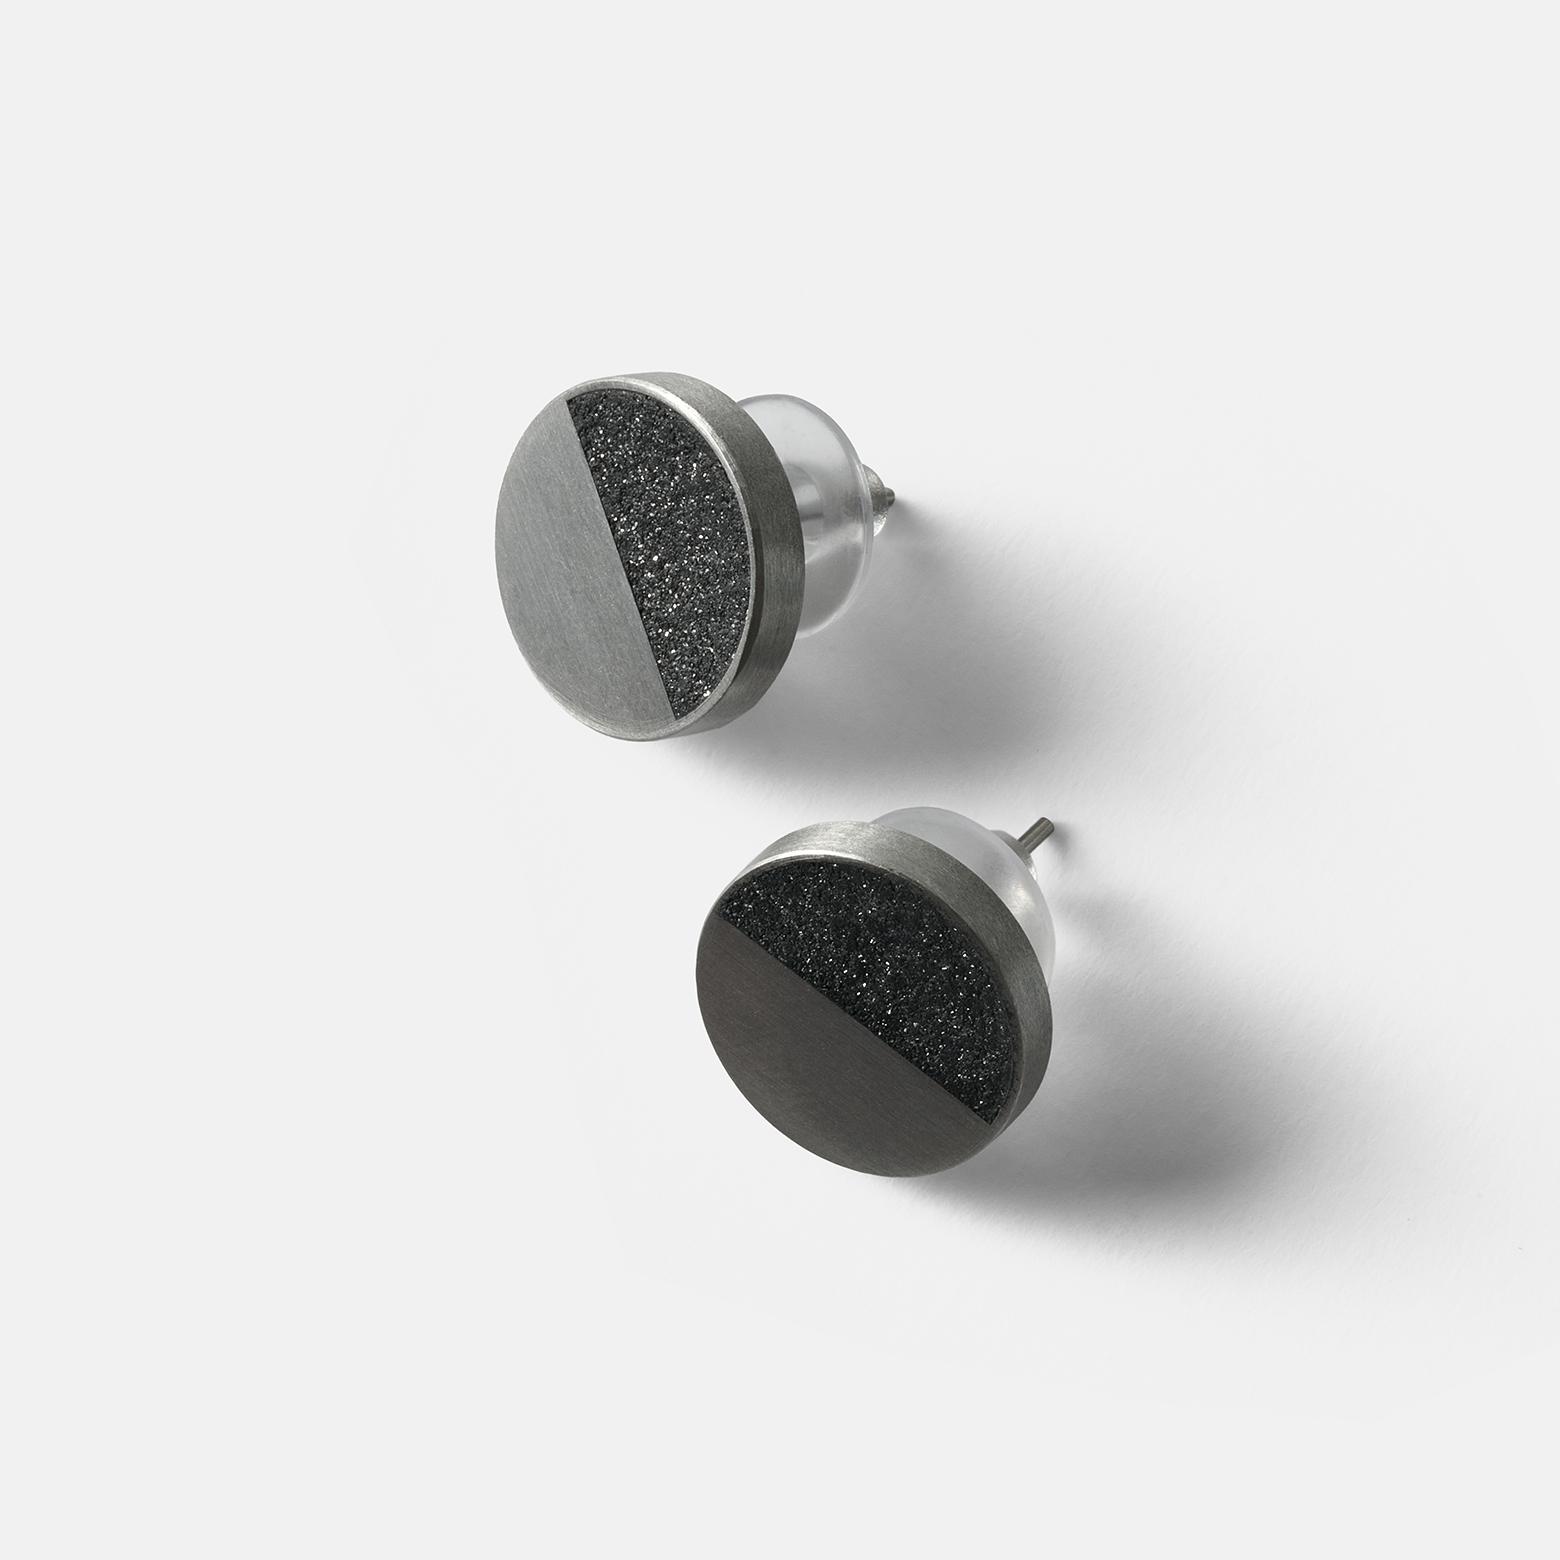 Konzuk Despina Concrete Earring — серьги-пусеты из стали и бетона